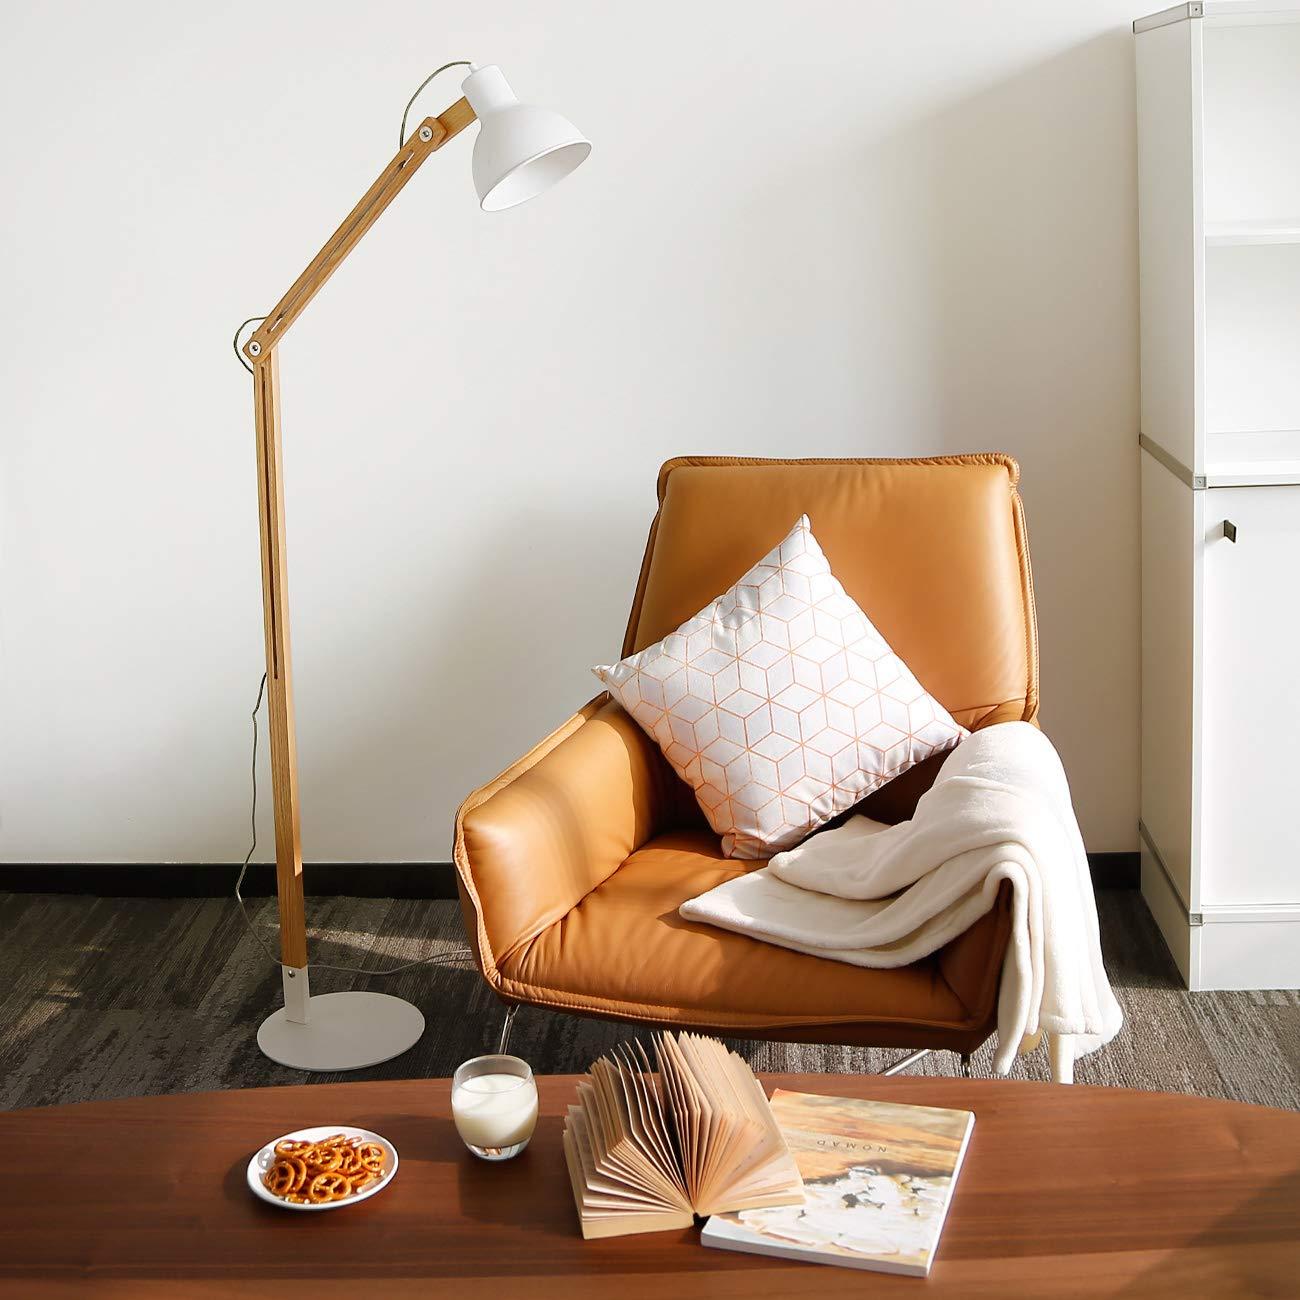 designer leselampe leselampe bett design design led leselampe bett lampe with designer. Black Bedroom Furniture Sets. Home Design Ideas